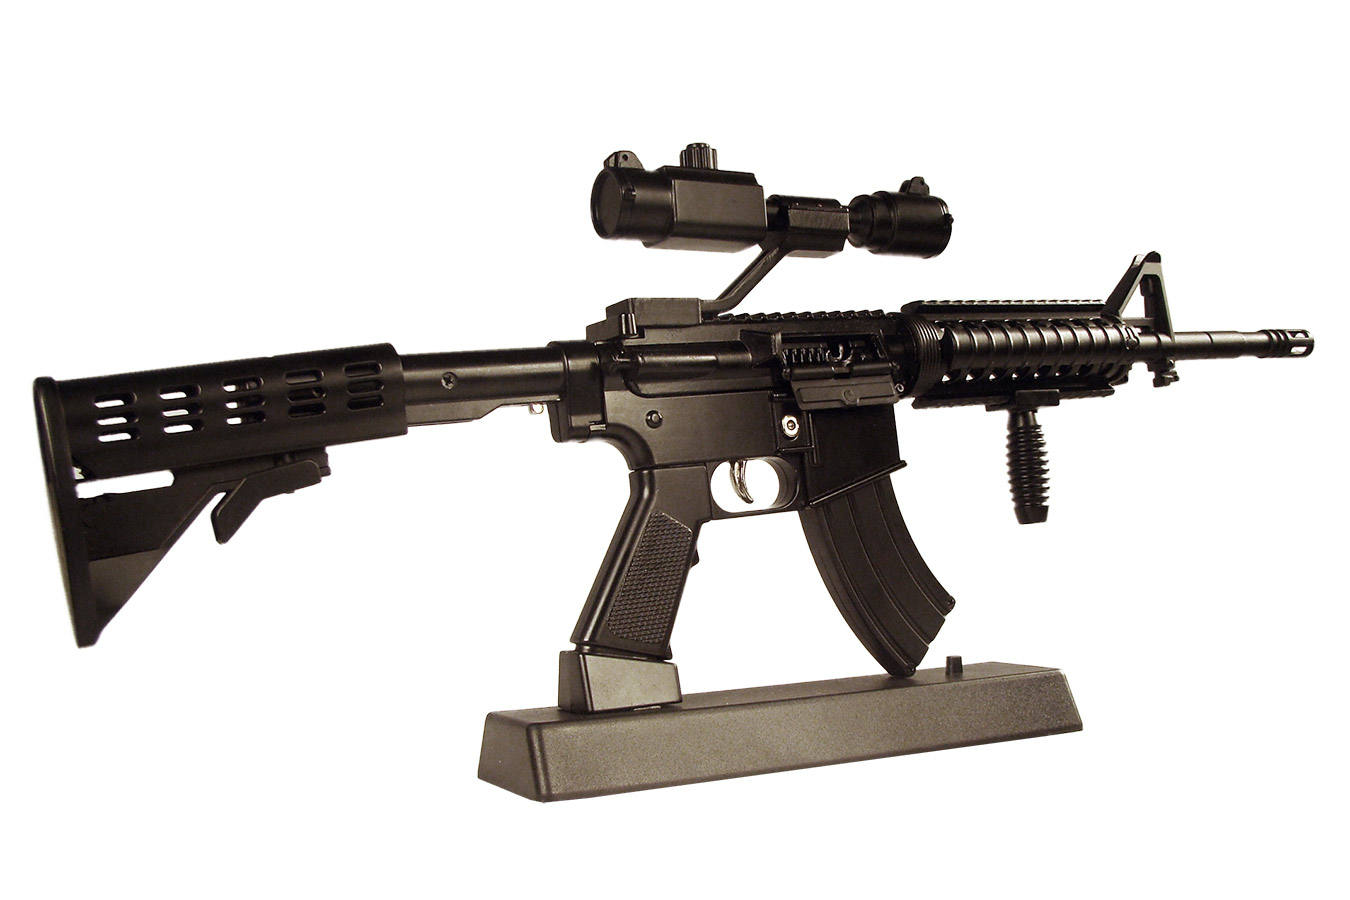 Макет автоматического карабина Colt M4 в масштабе 1:2